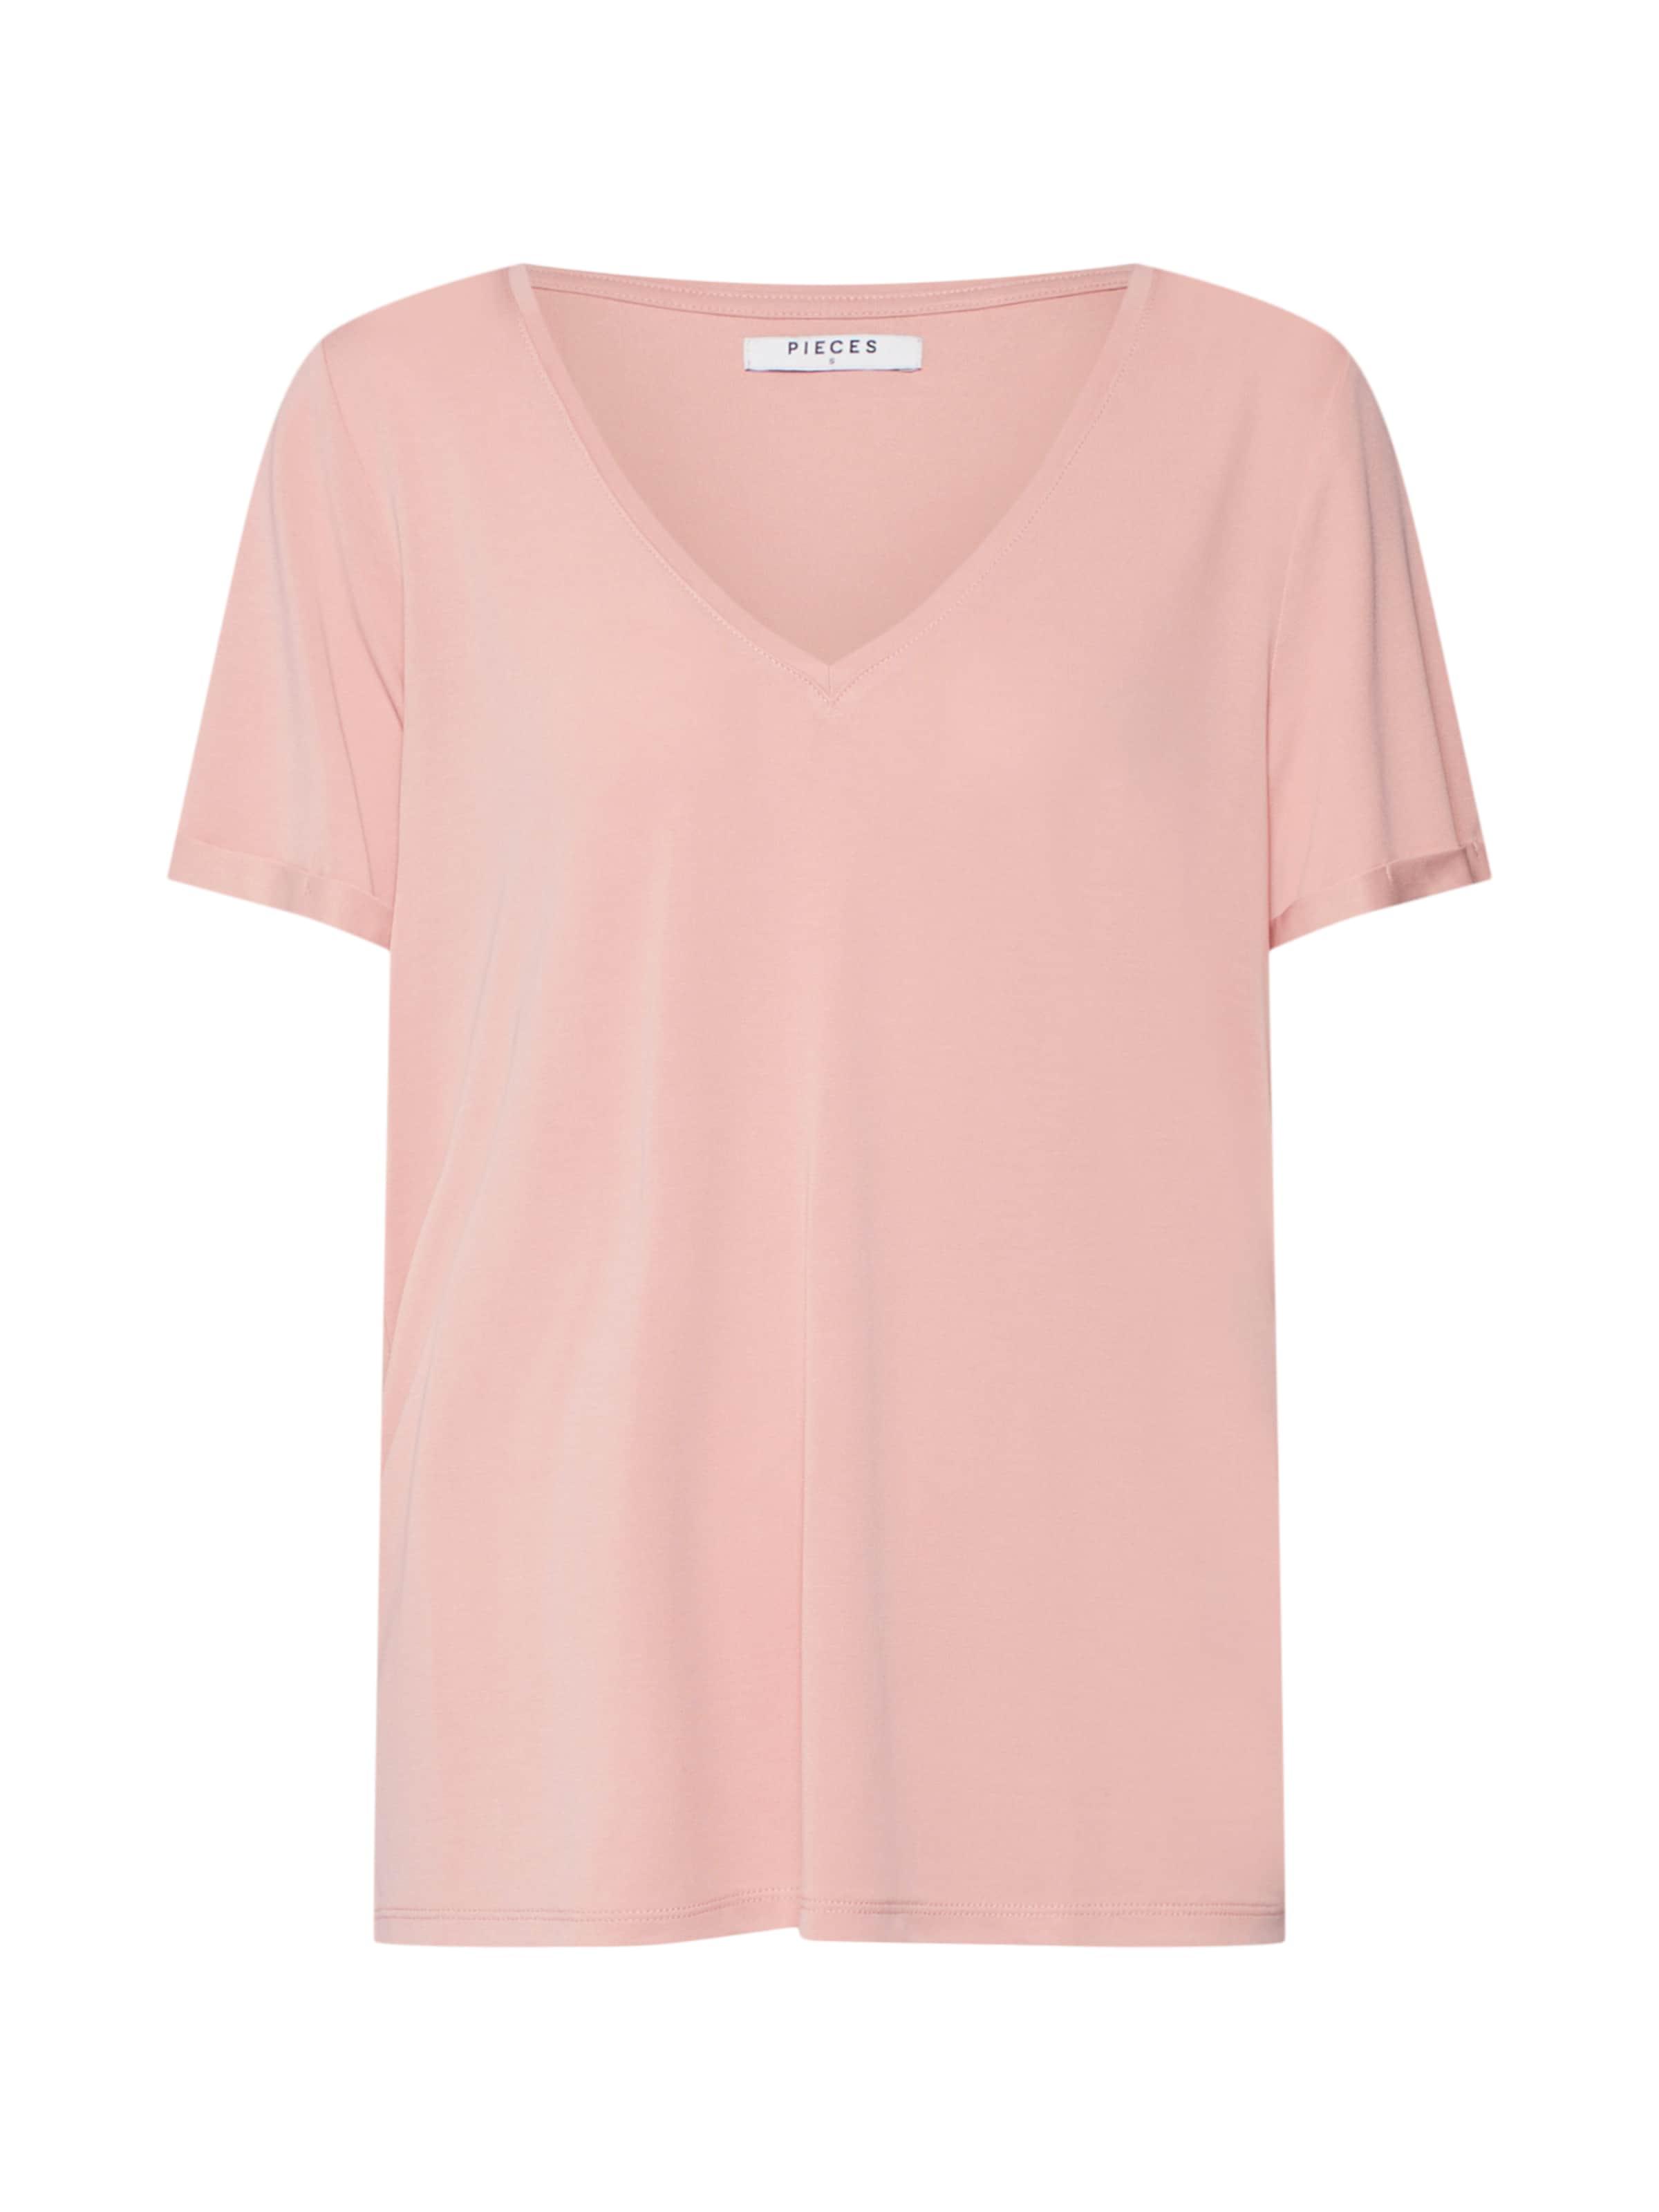 In shirt In PiecesT Rosé Rosé PiecesT shirt Rosé PiecesT In shirt PiecesT shirt In WQoeBxrdC